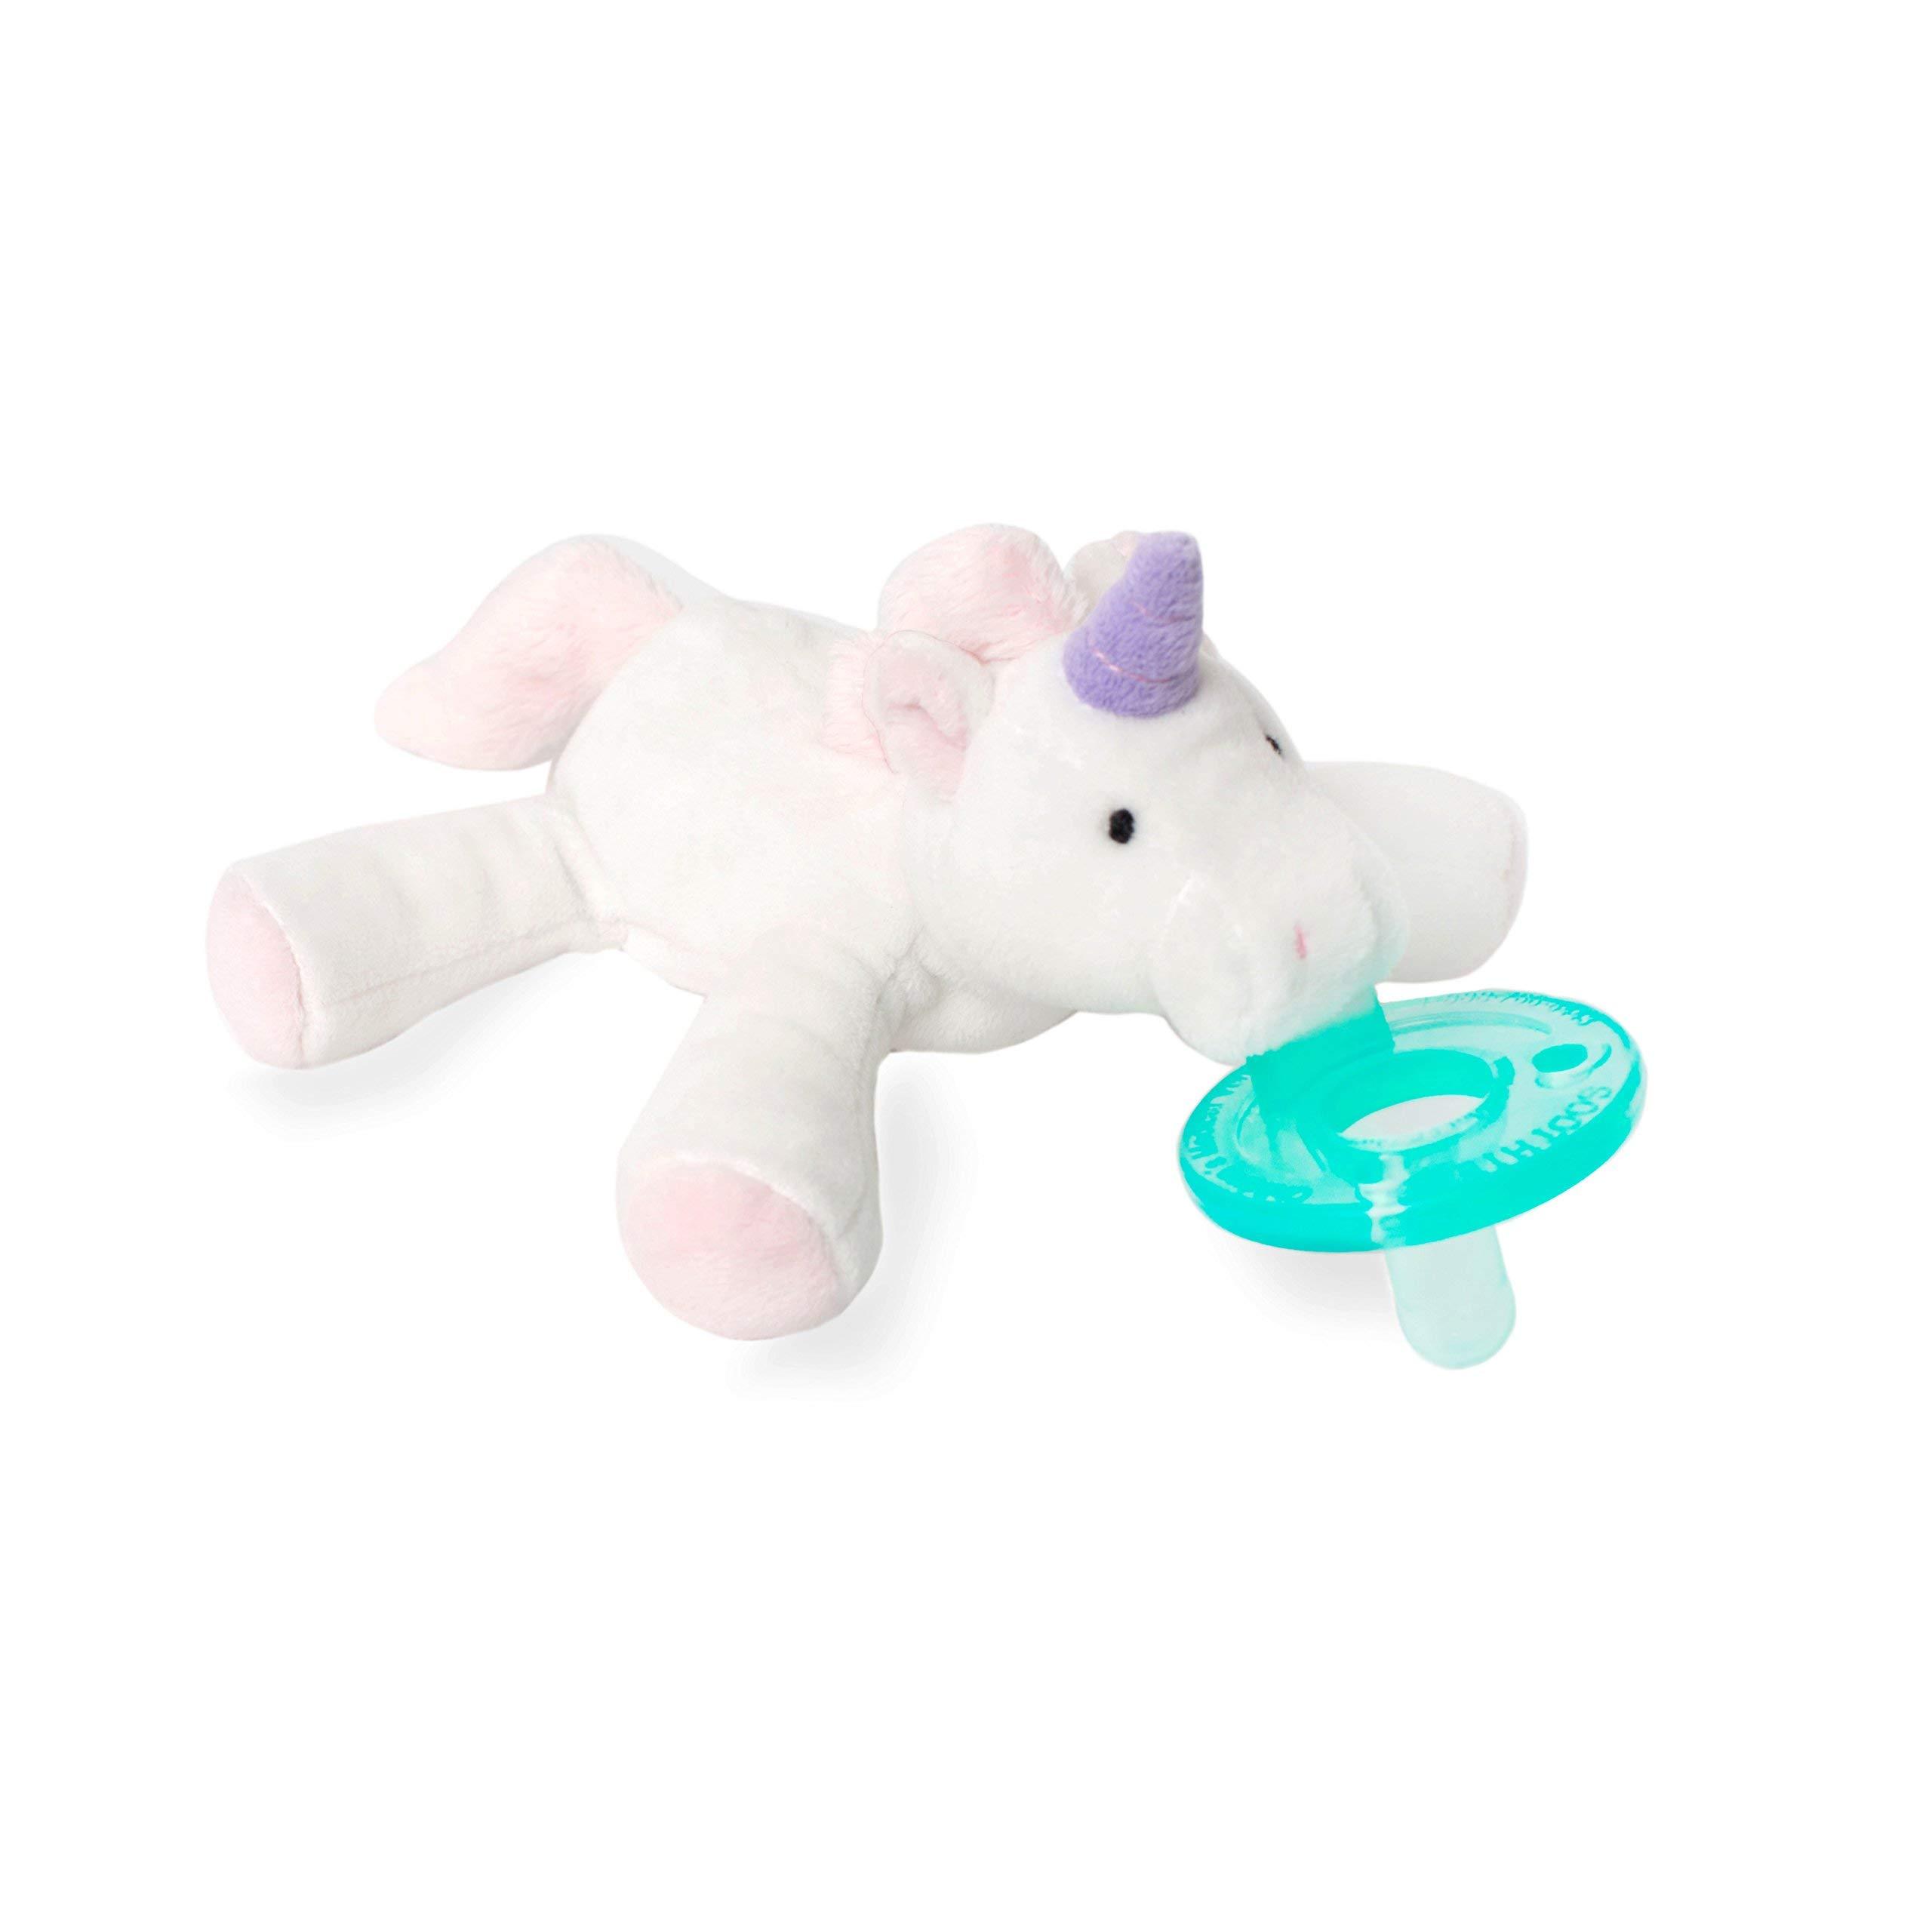 WubbaNub Infant Pacifier - Baby Unicorn by WubbaNub (Image #3)